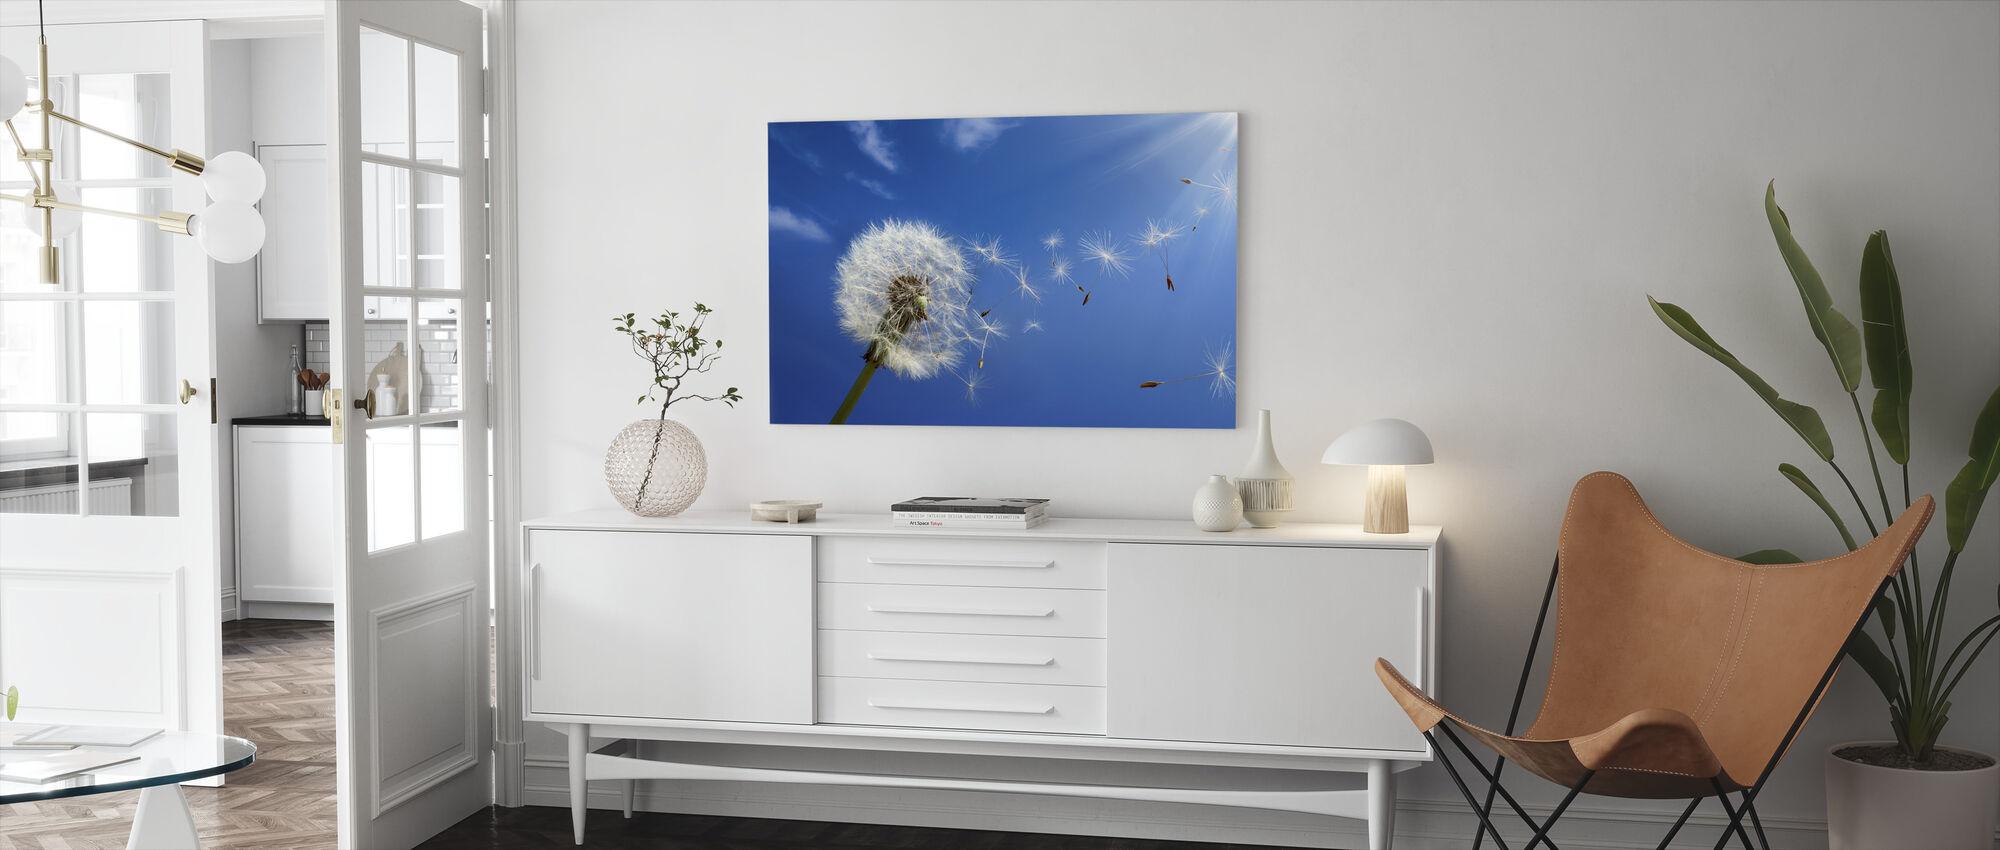 Dreams of Dandelion - Canvas print - Living Room